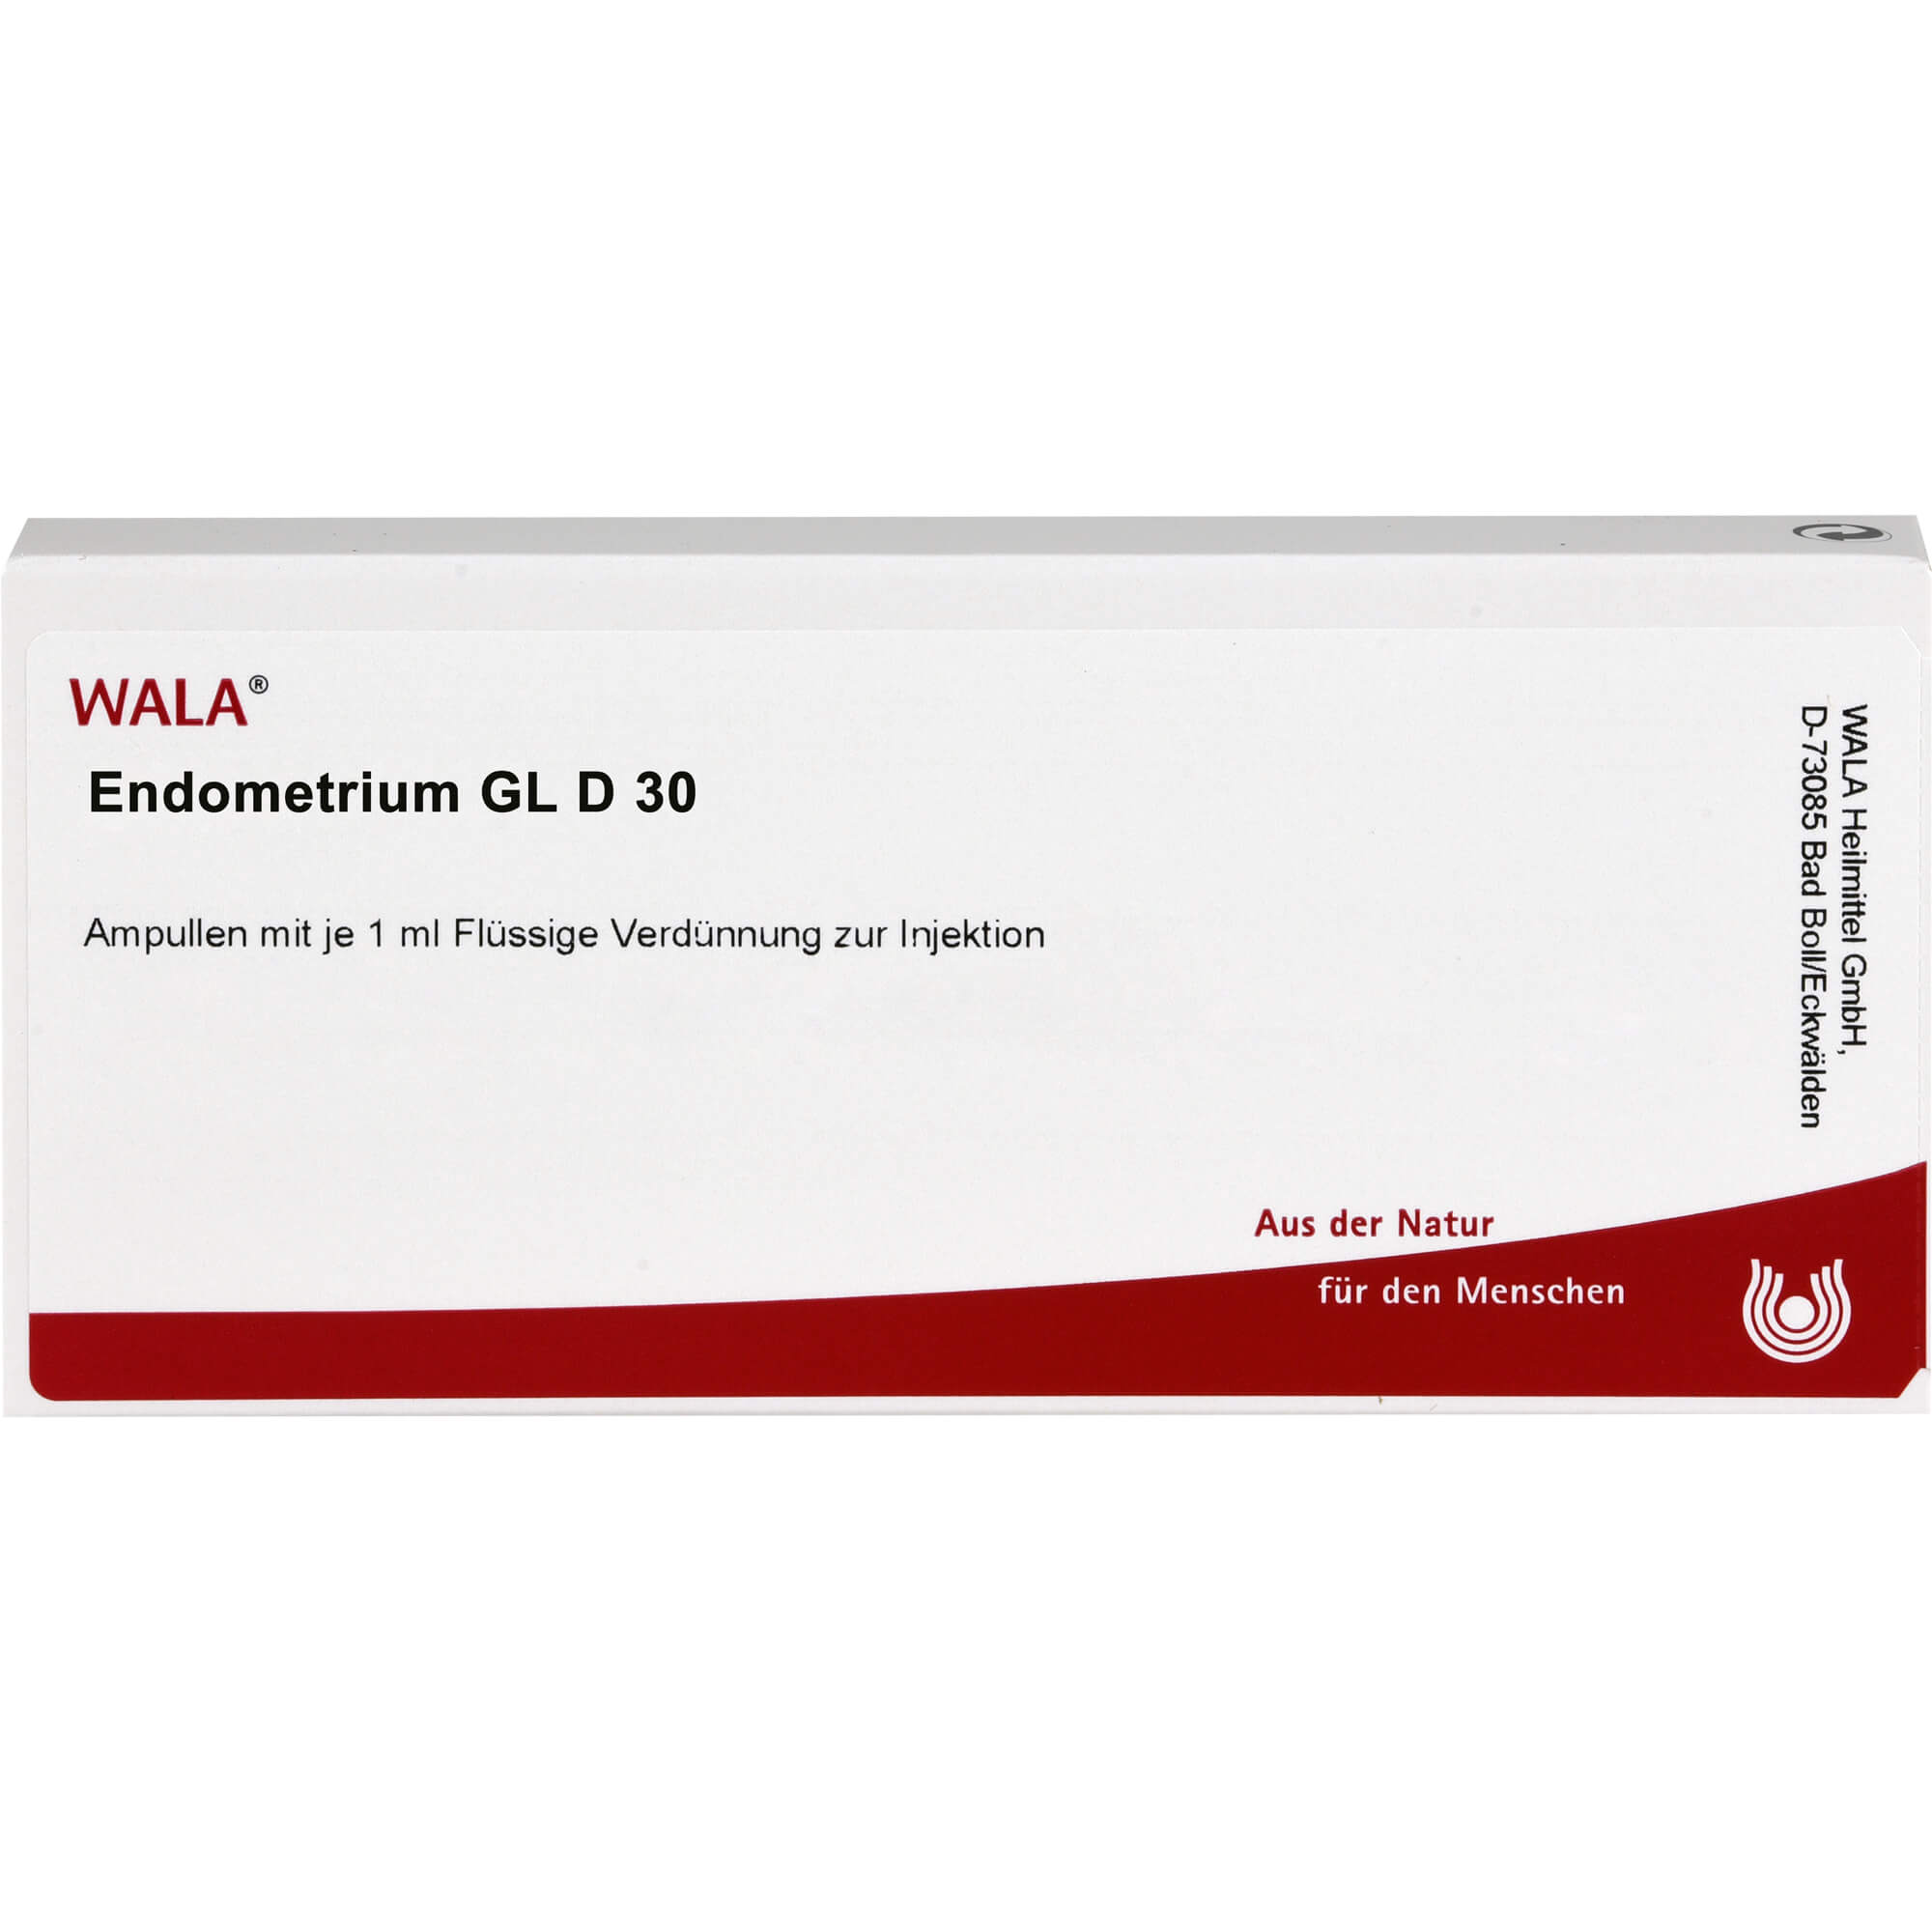 ENDOMETRIUM-GL-D-30-Ampullen